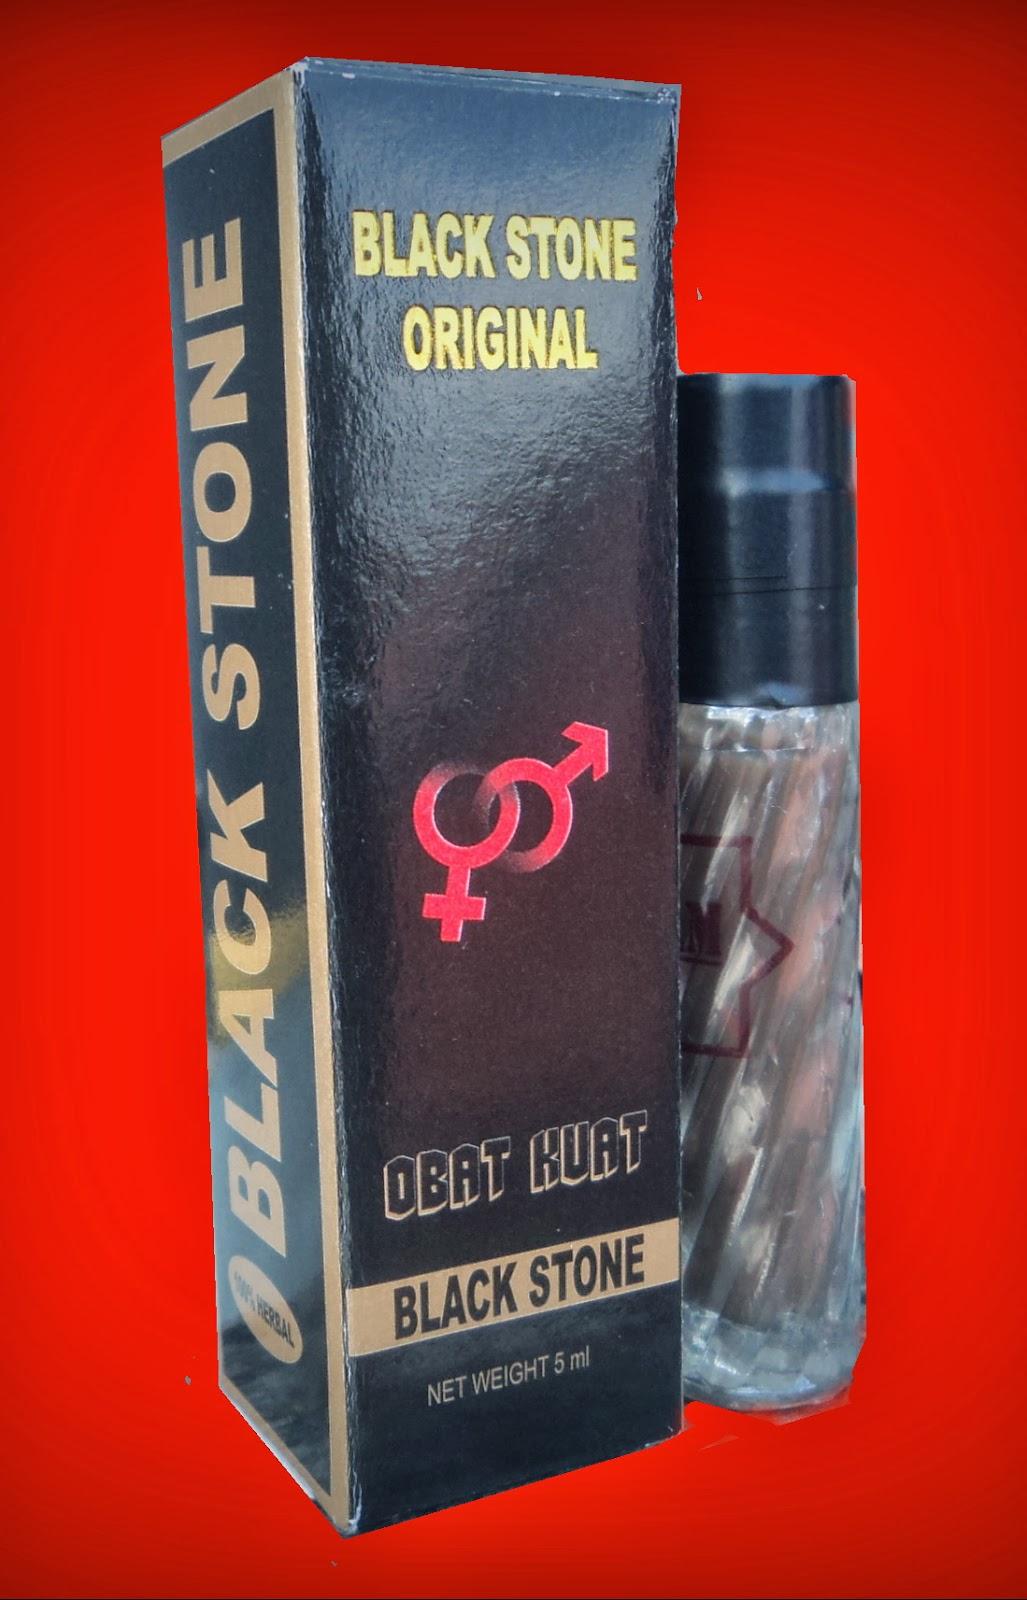 obat kuat black stone original obat kuat oles black stone bandung